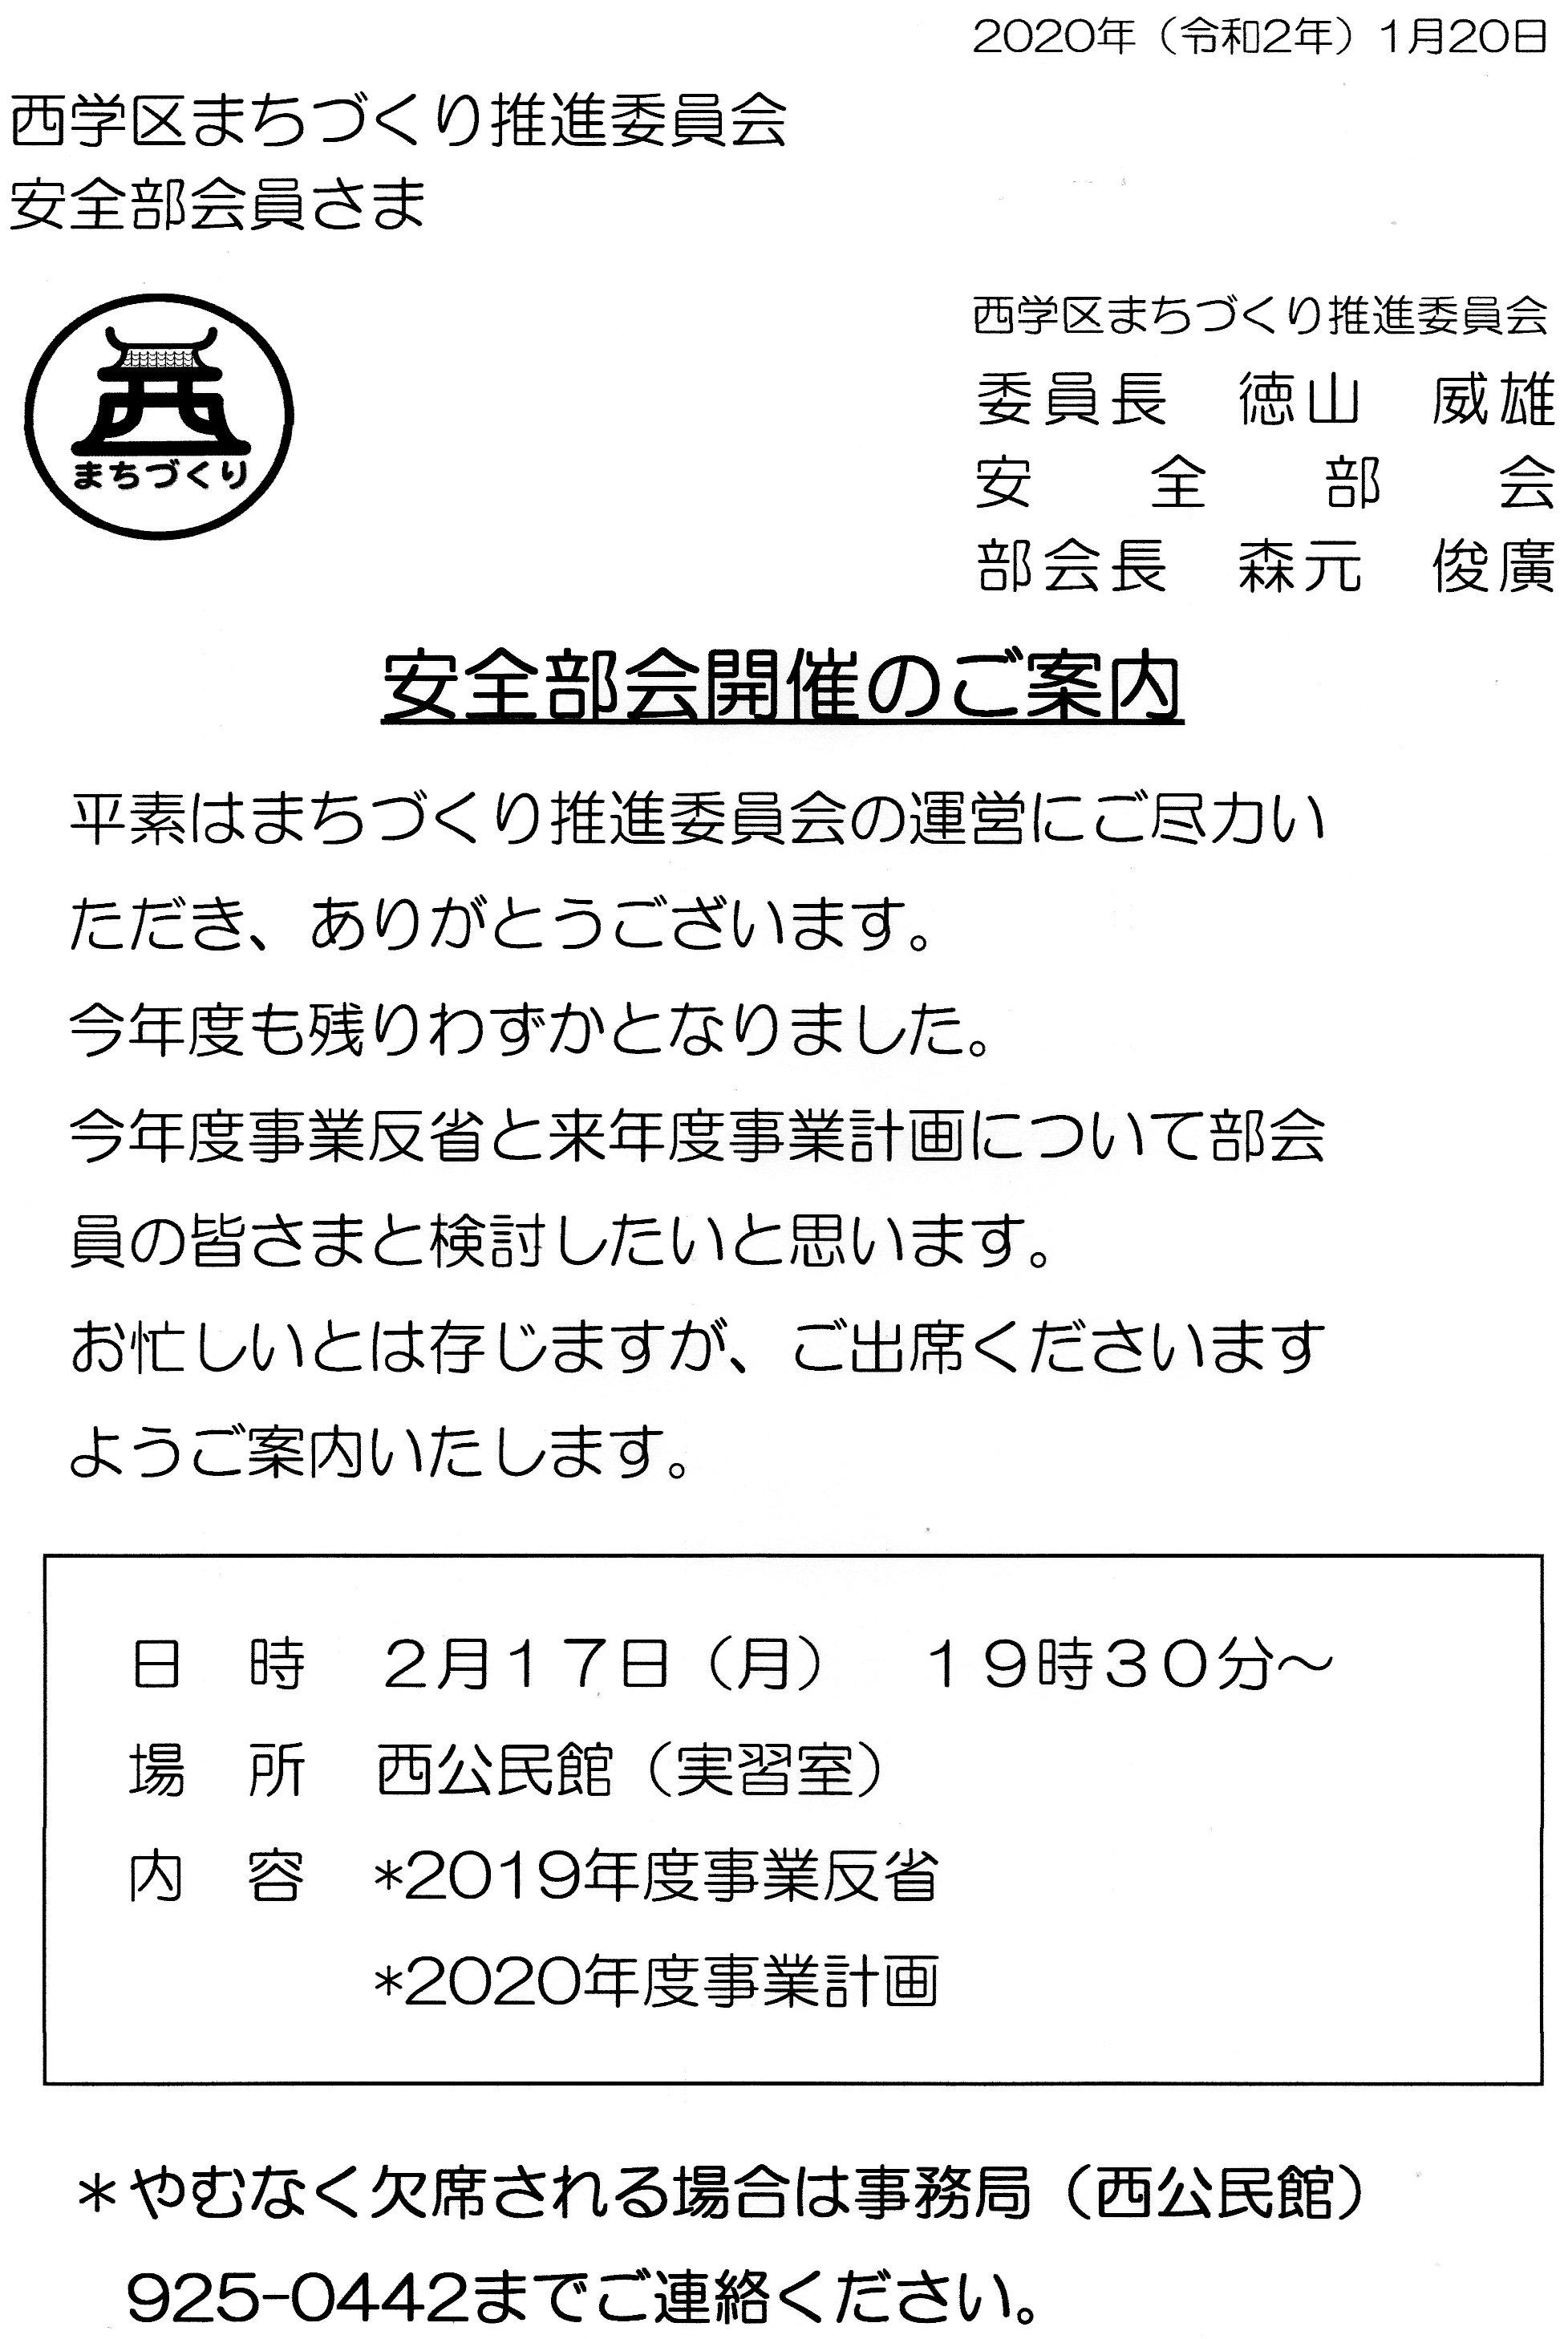 img122